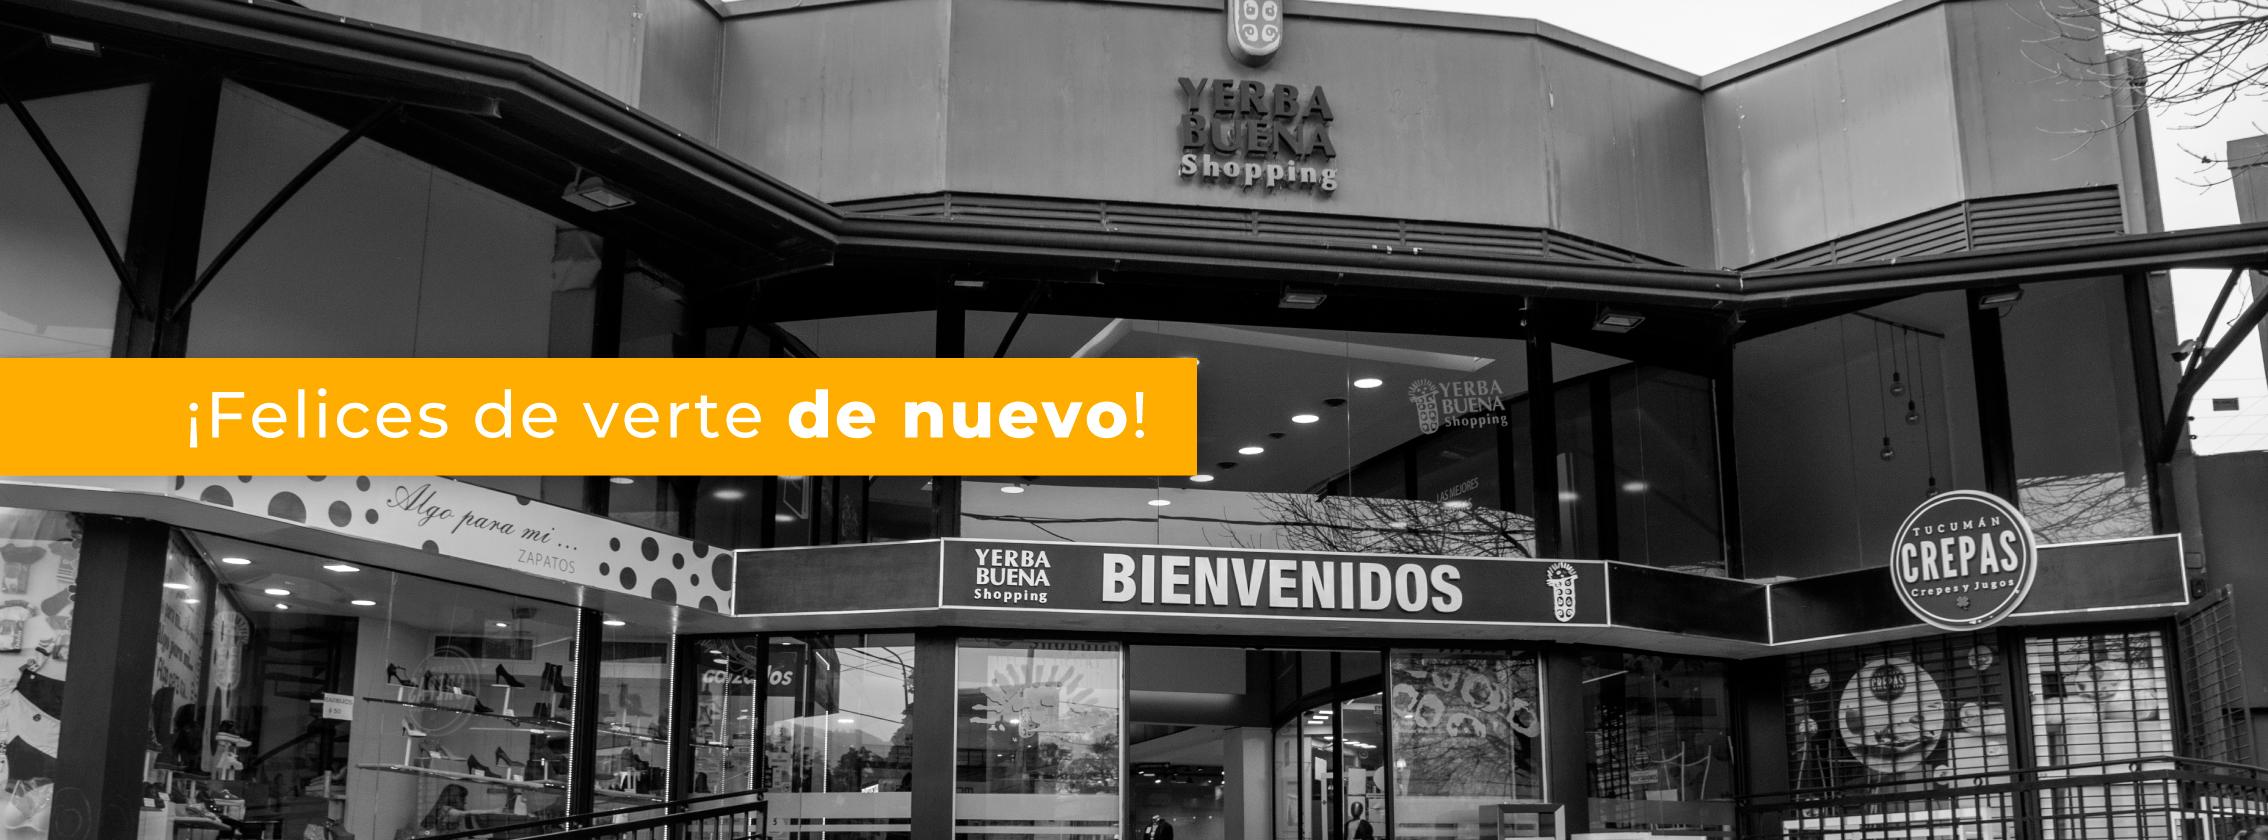 Yerba-Buena-Shopping-Web